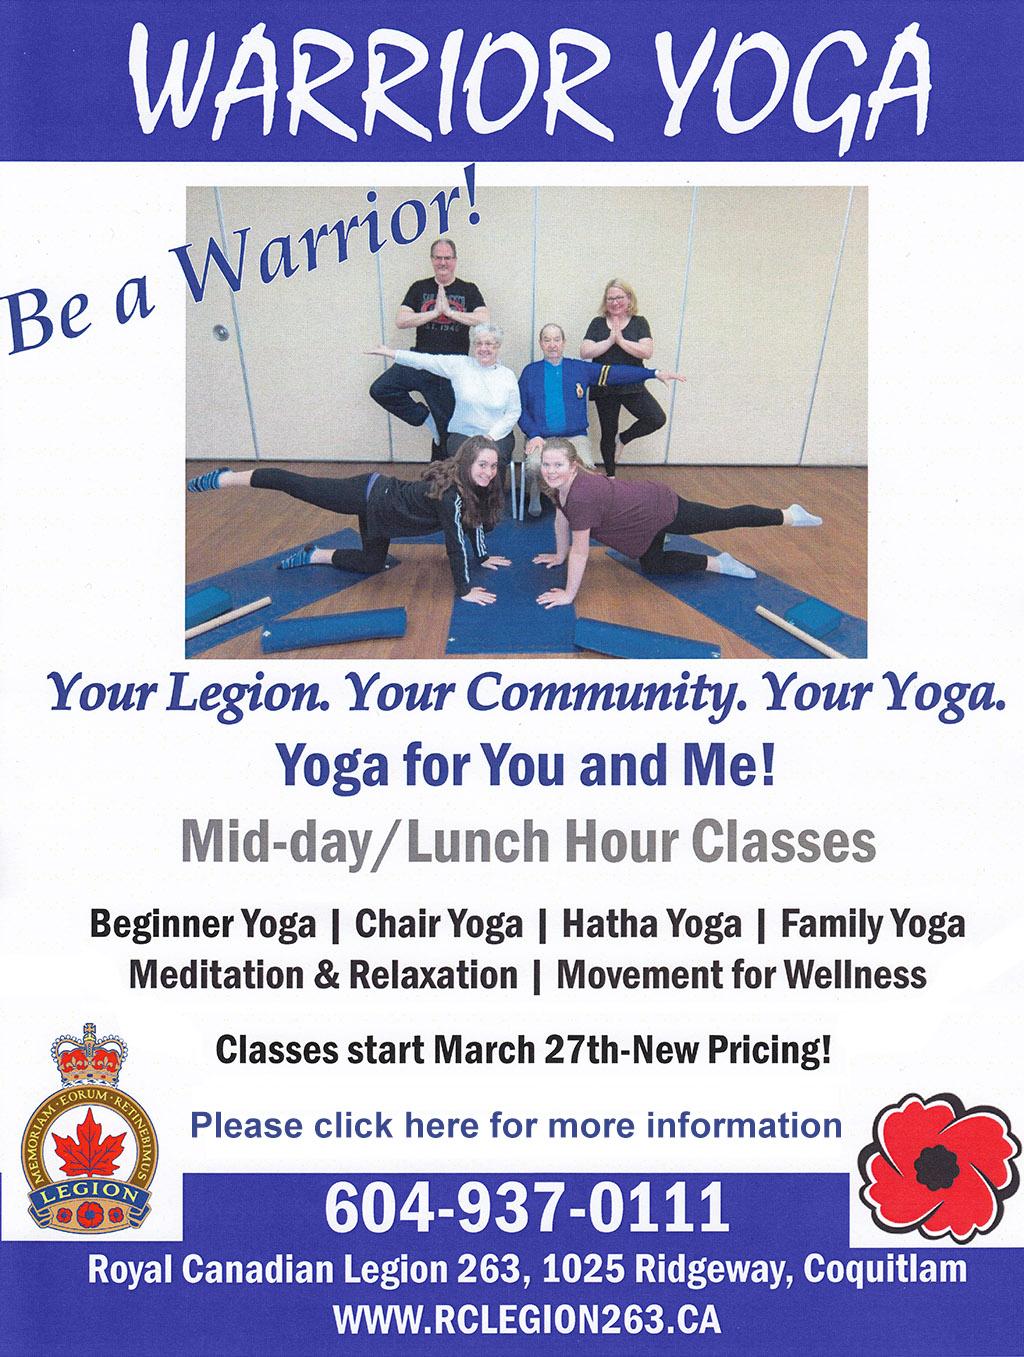 warrior yoga poster